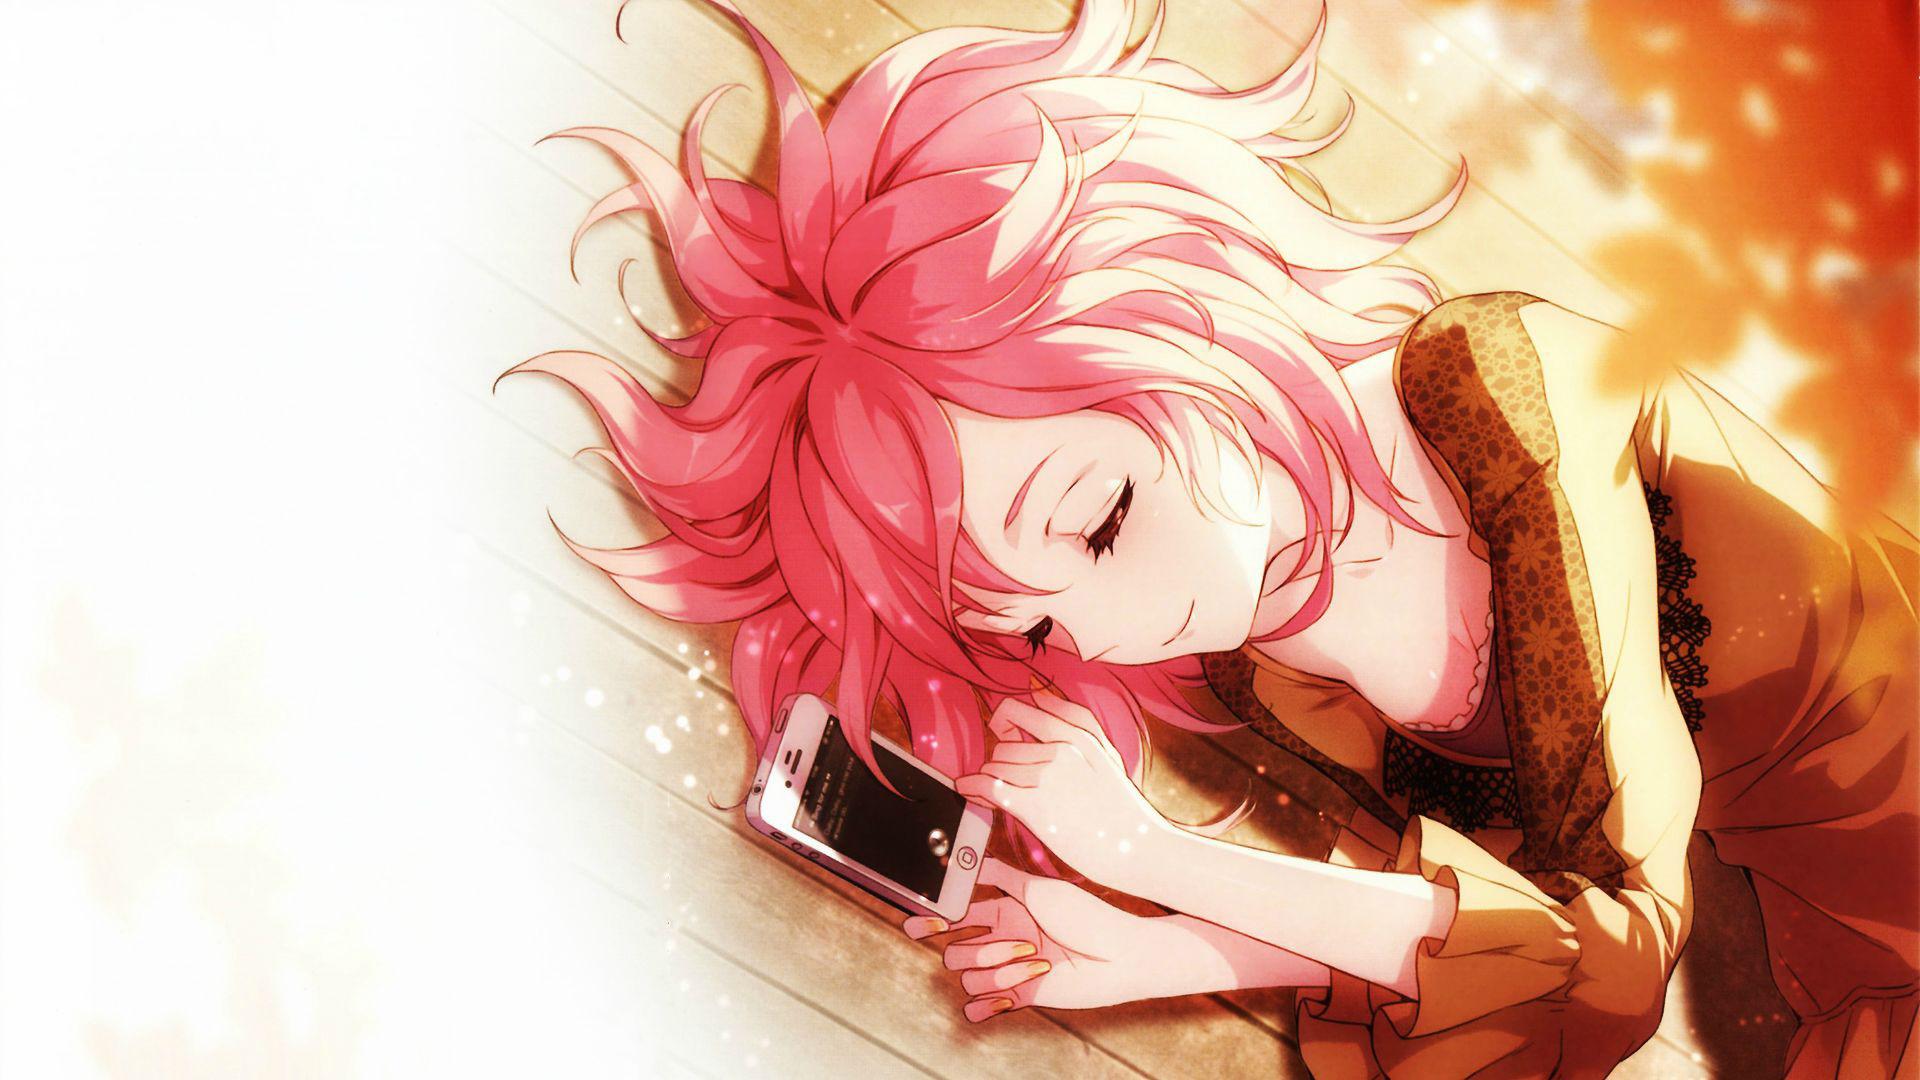 Res: 1920x1080, Anime-Wallpaper-Desktop-Background-77 152 Anime Wallpaper Examples For Your  Desktop